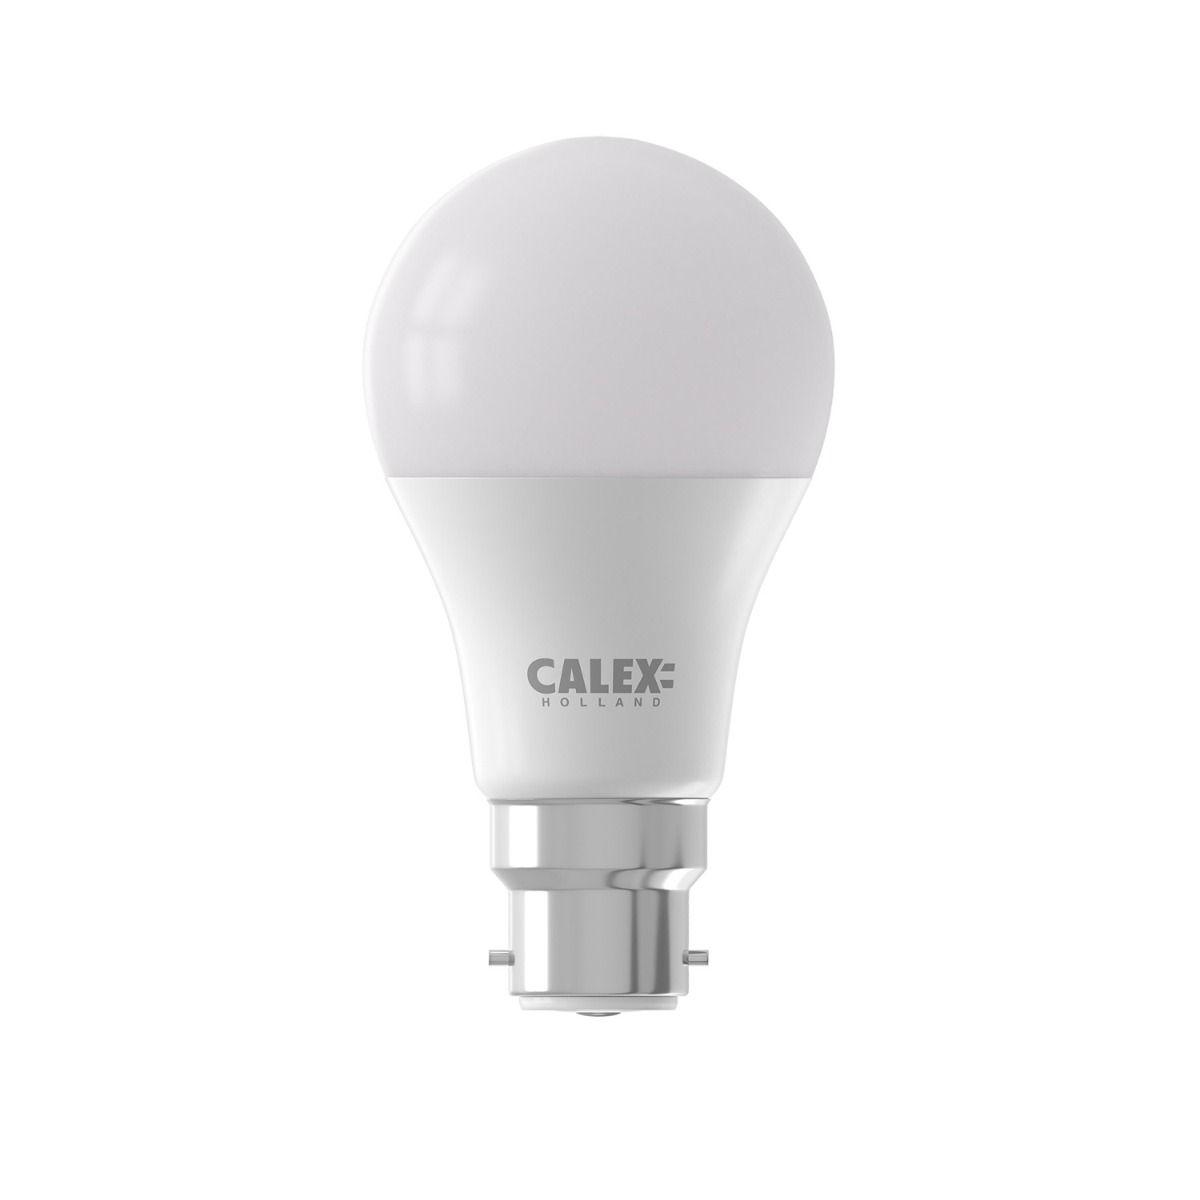 Calex Smart Standard LED Bulb B22 9W 806lm 2200-4000K   Tuya Wifi